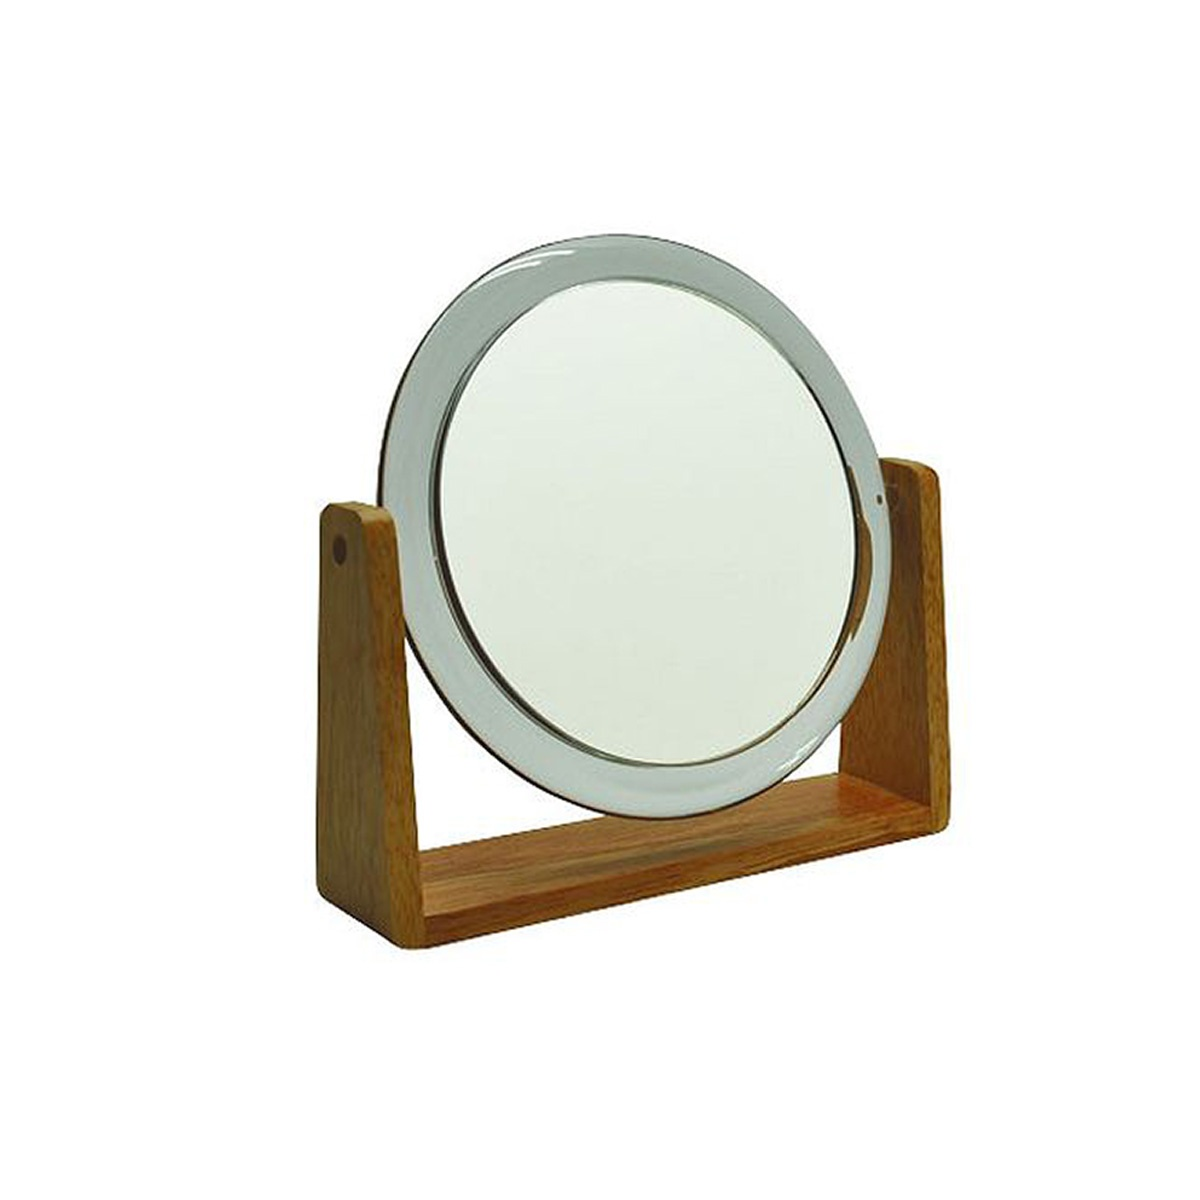 Miroir grossissant (x7) en bois (Bois)